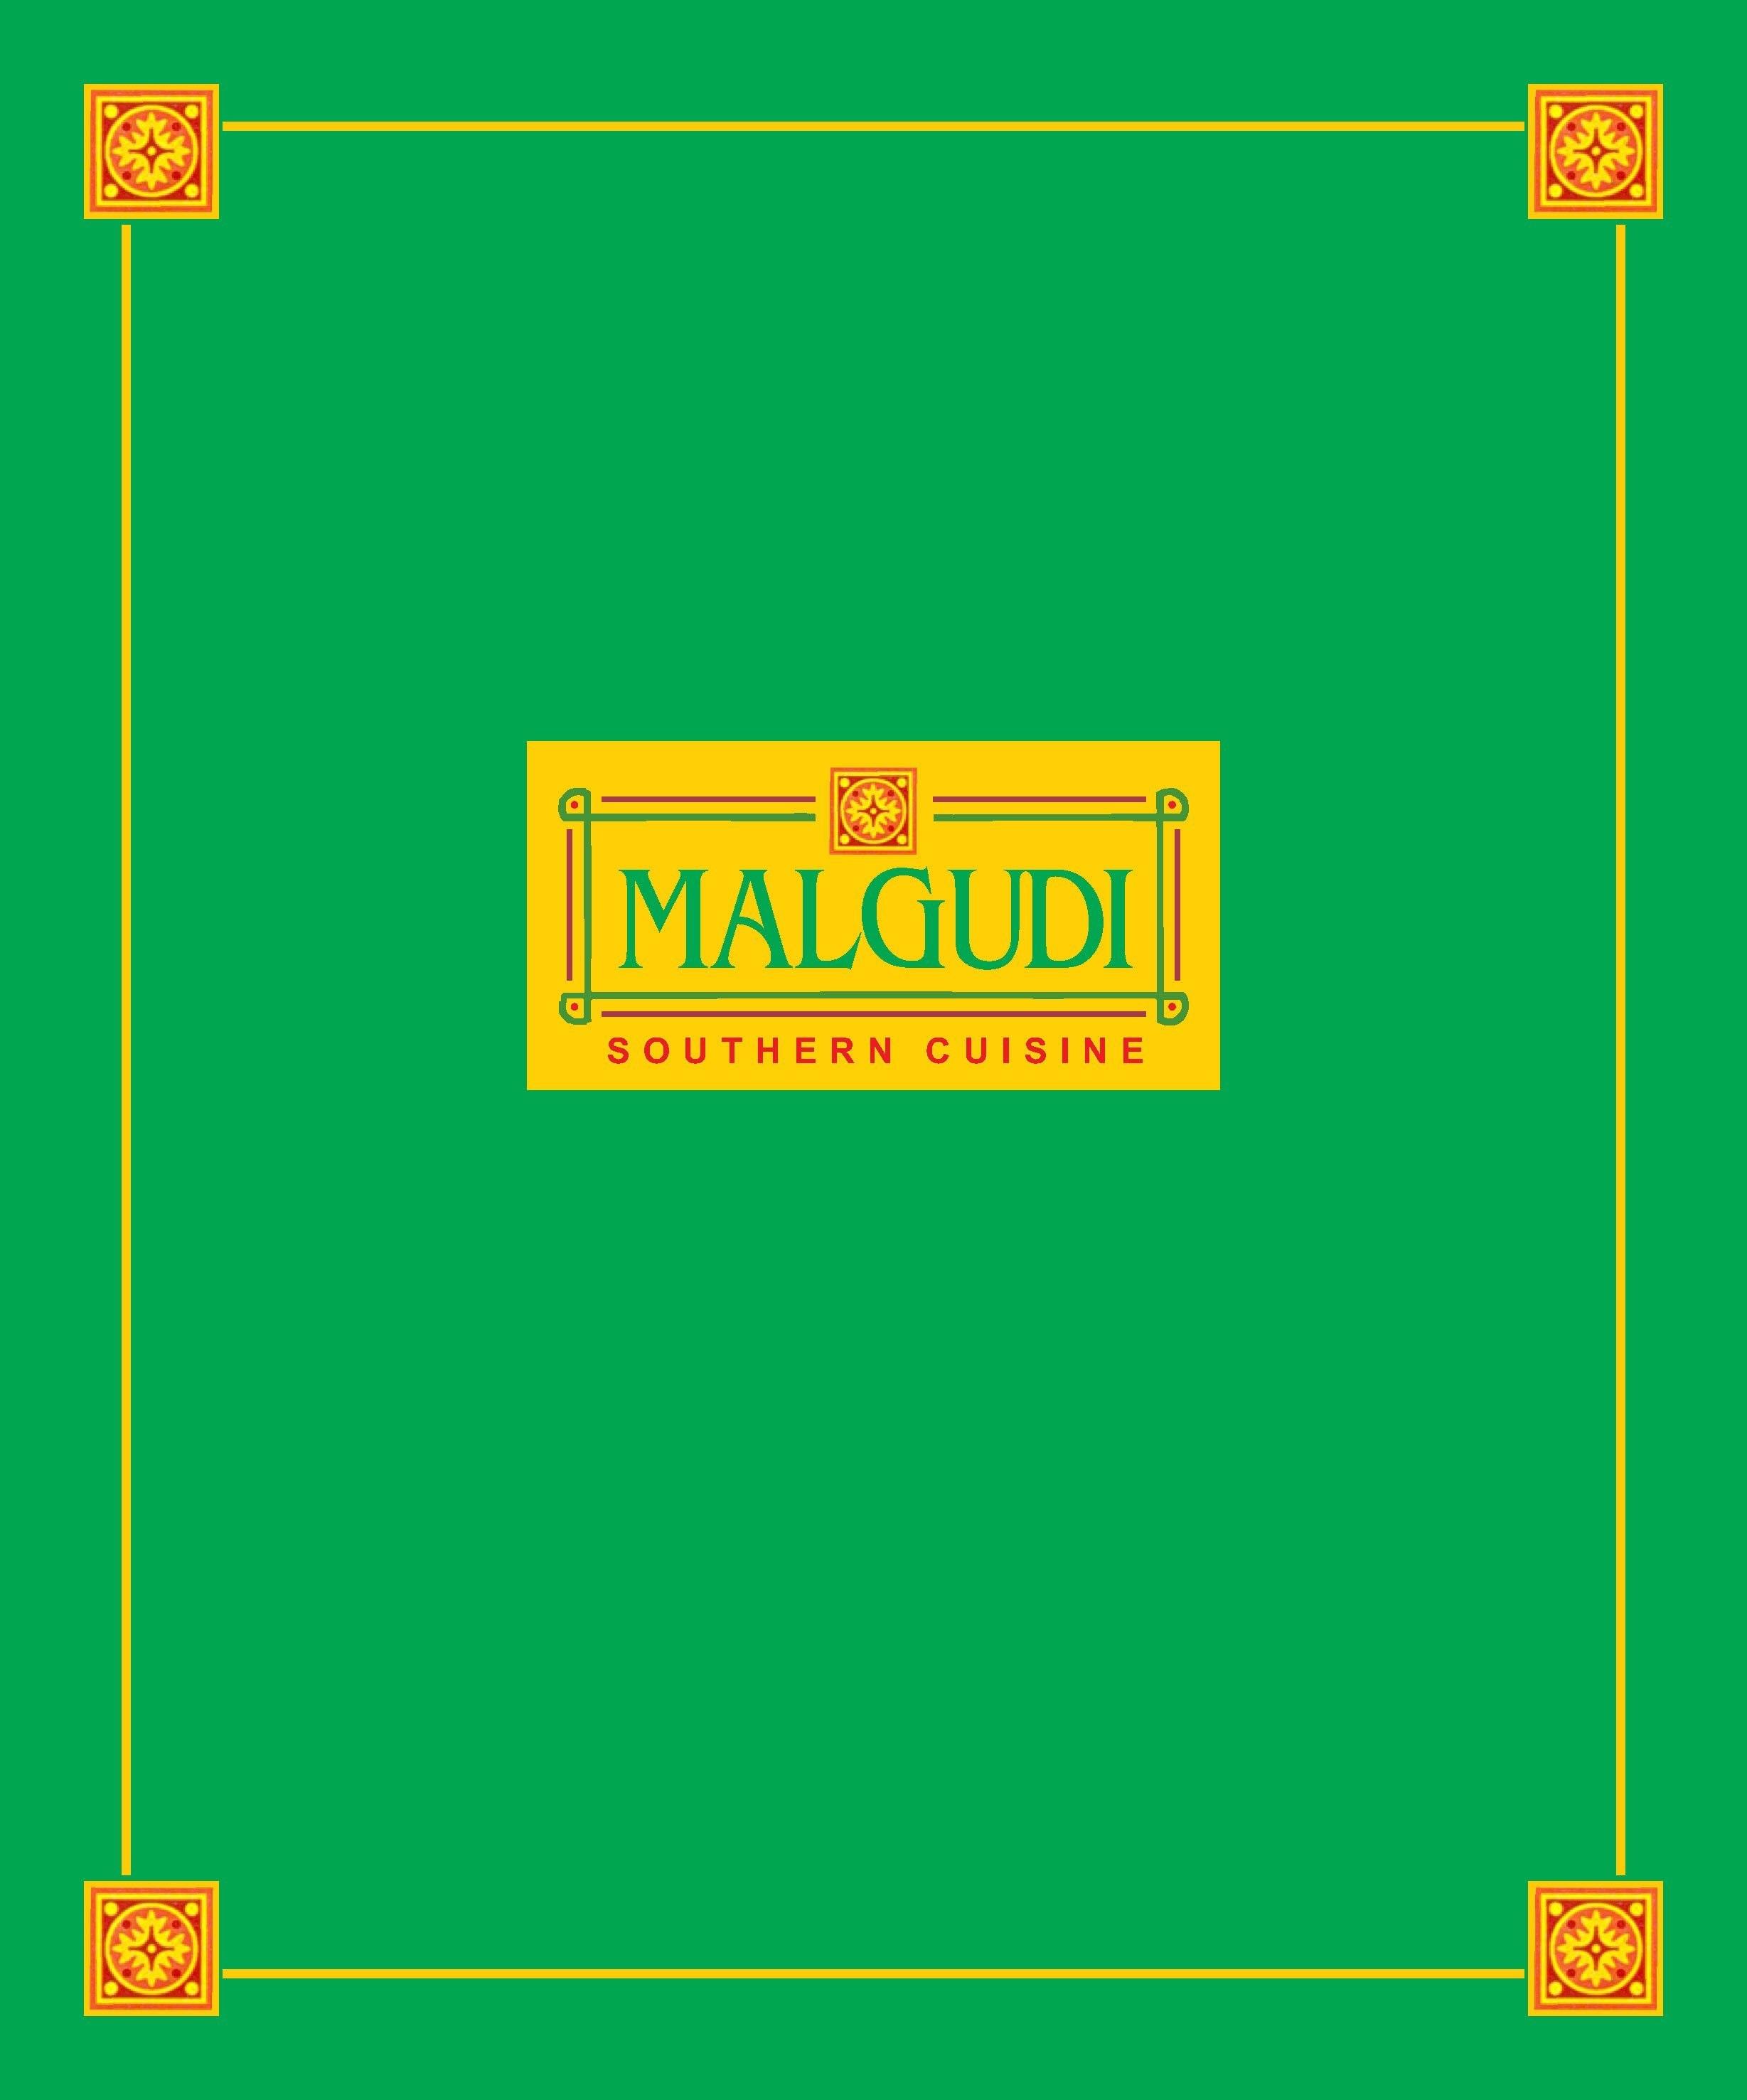 Malgudi - KR Puram - Bangalore Image